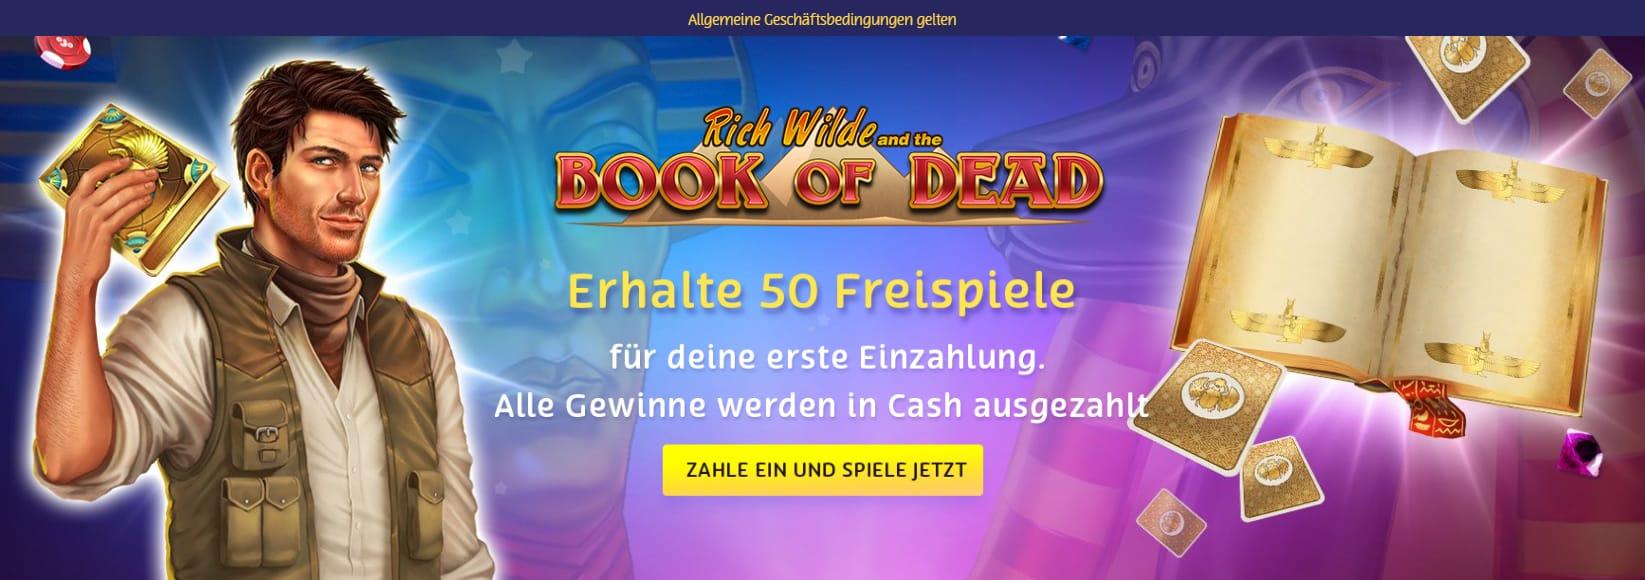 PlayOJO Casino Content Images - Germany CasinoTop 01